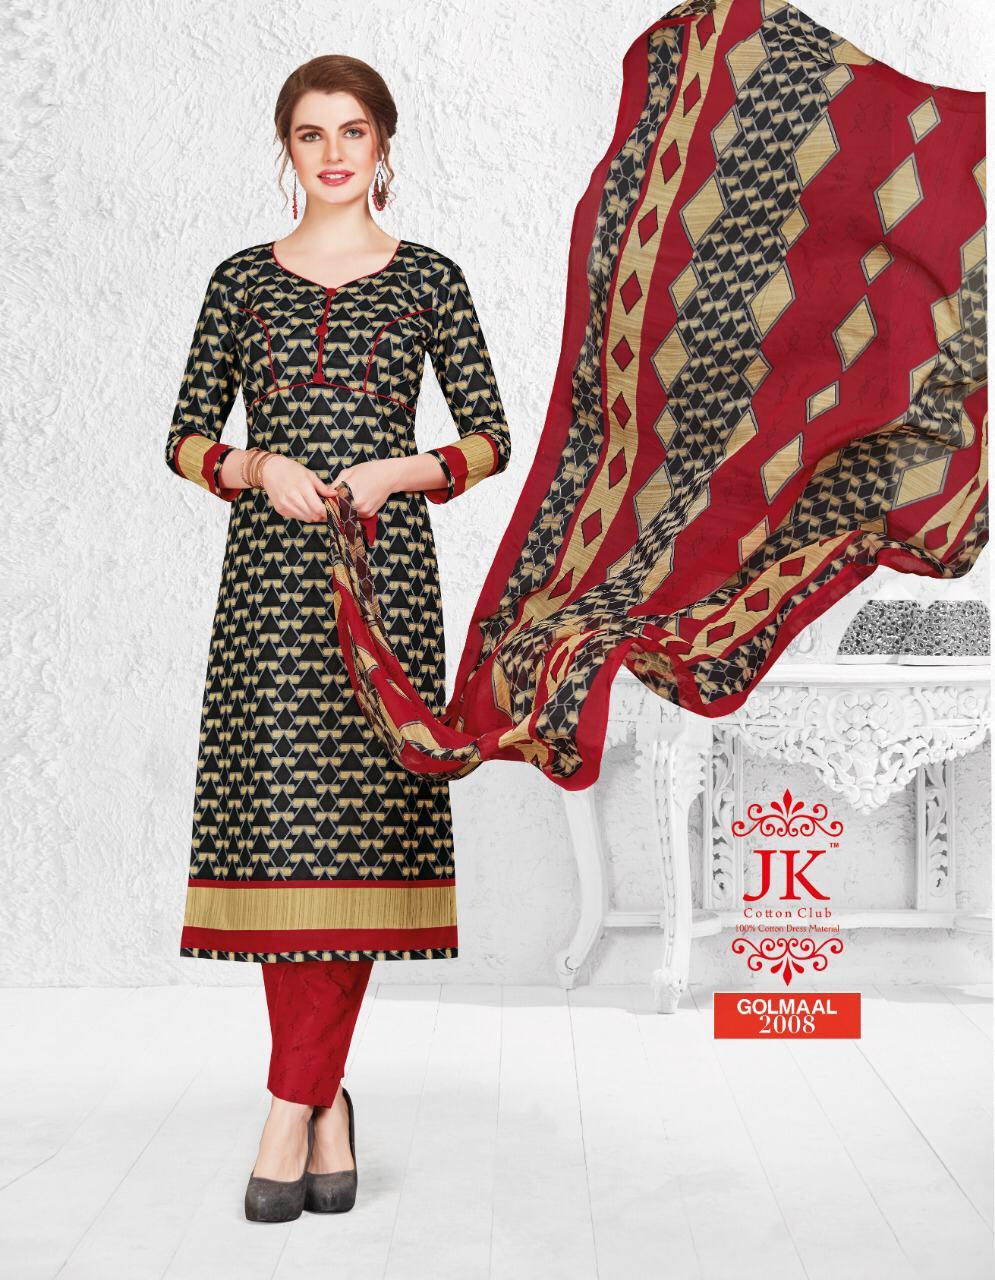 Jk Cotton Club Golmaal Vol 2 Designer Suits Wholesale Lot